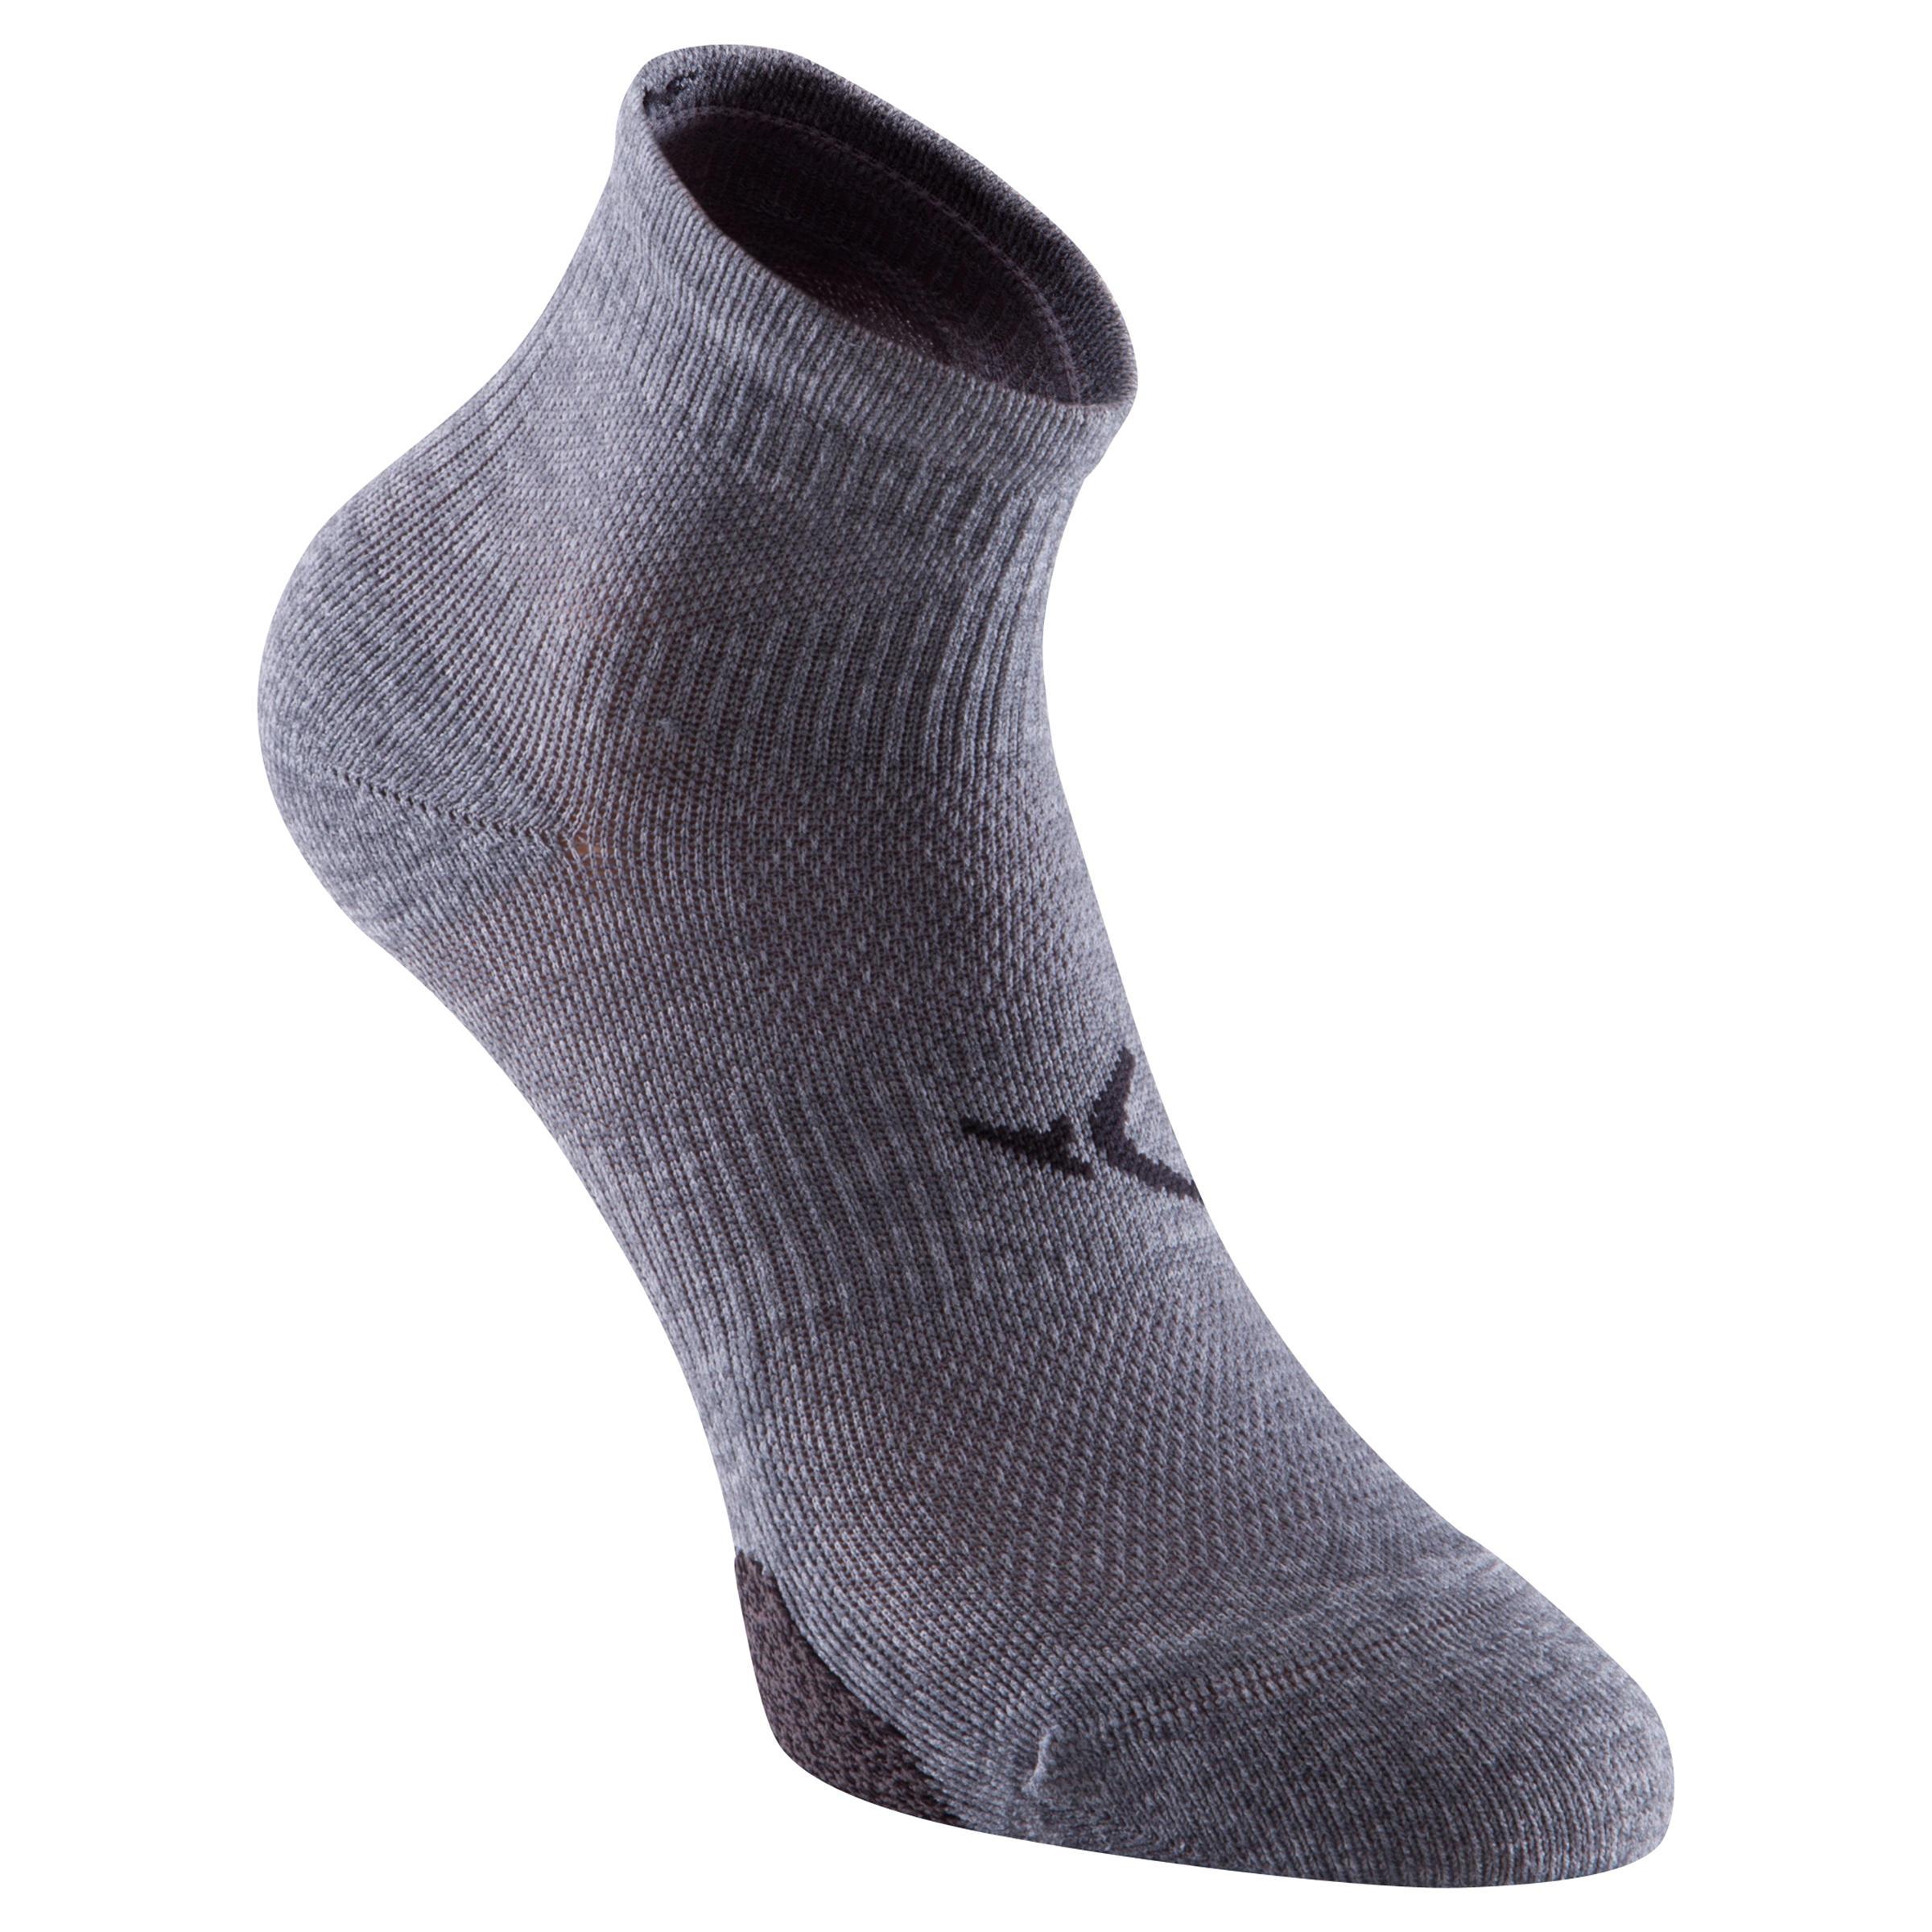 Calcetines cortos fitness x2 gris 500